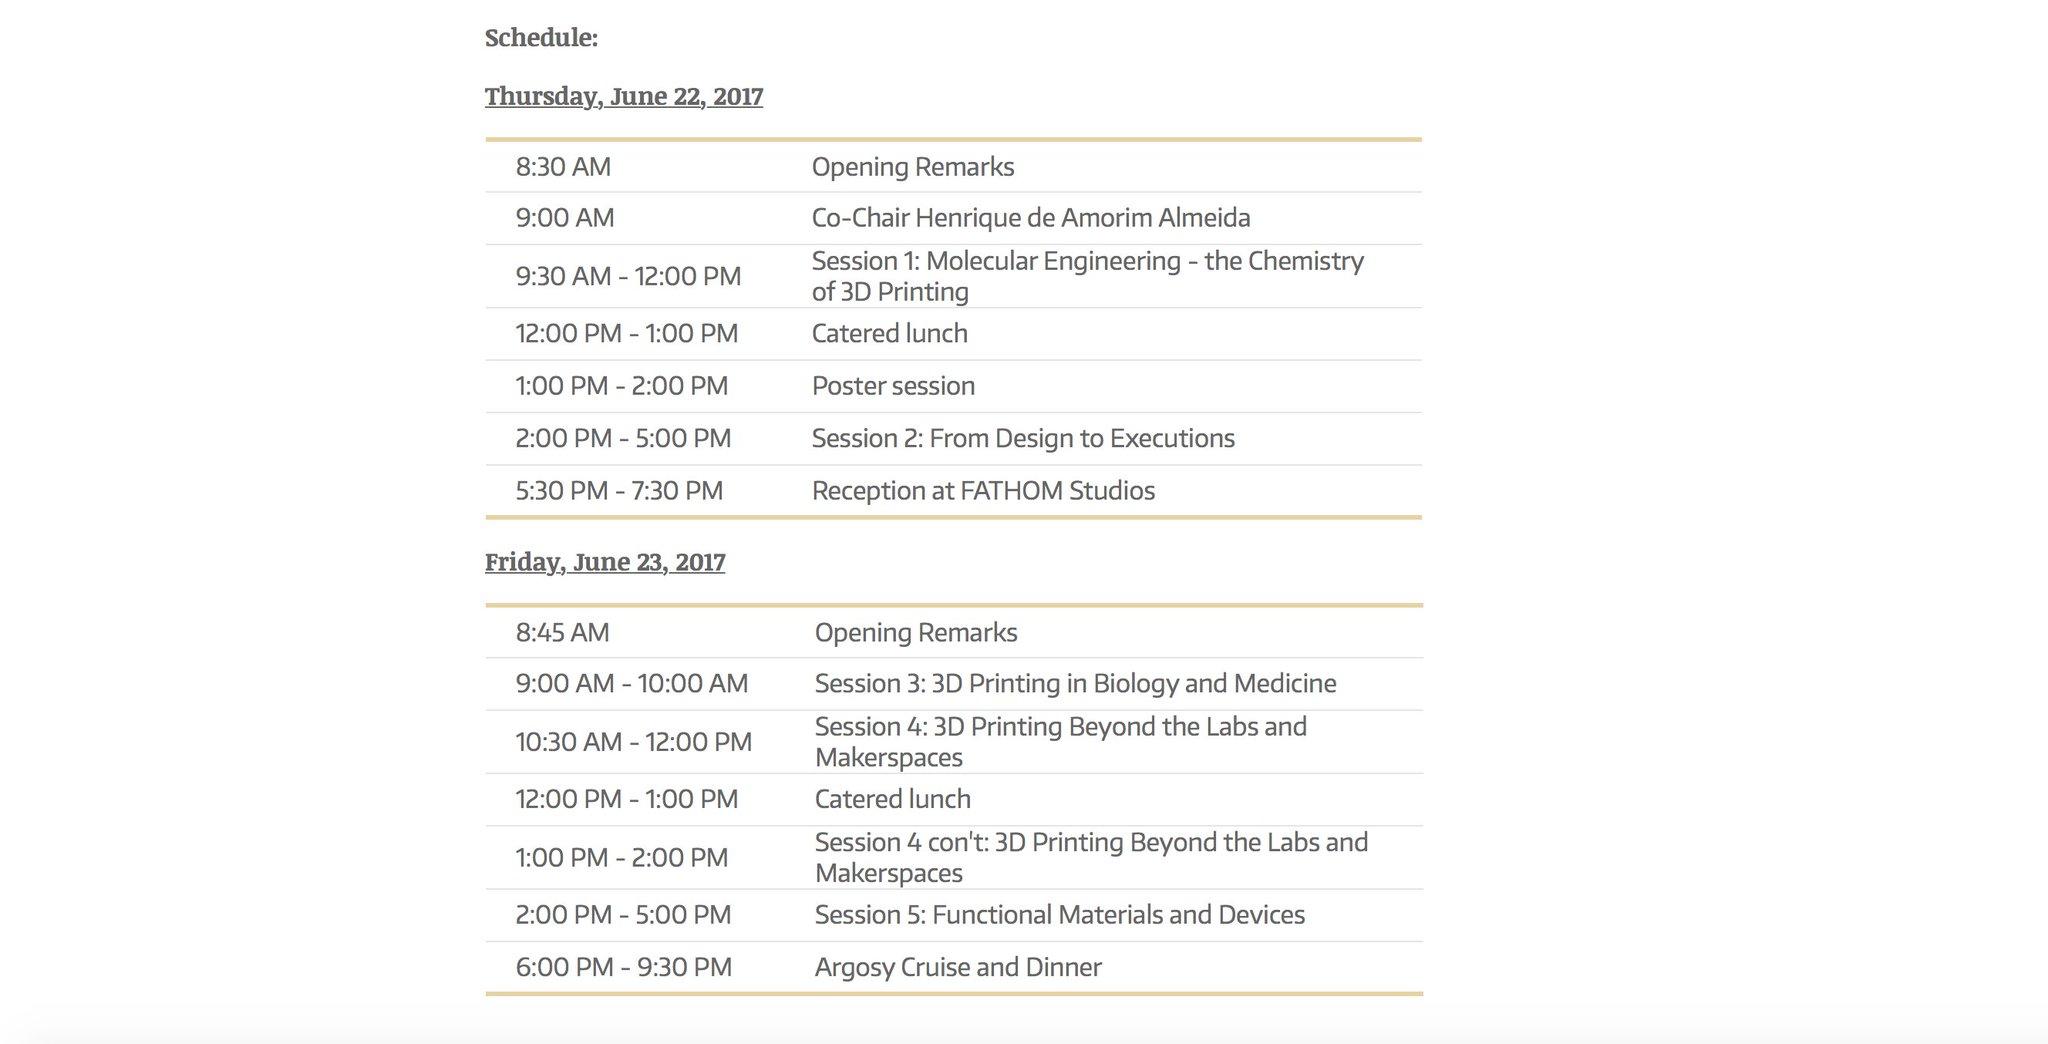 😀 Heading 2 #Seattle 🌲 #3Dprinting Symposium Th/F! https://t.co/ElWFLW3IJu #BioPrinting #HITsm #HCLDR #HIMSSmakers #InventHealth #MakeHealth https://t.co/qr8P0sNQwB